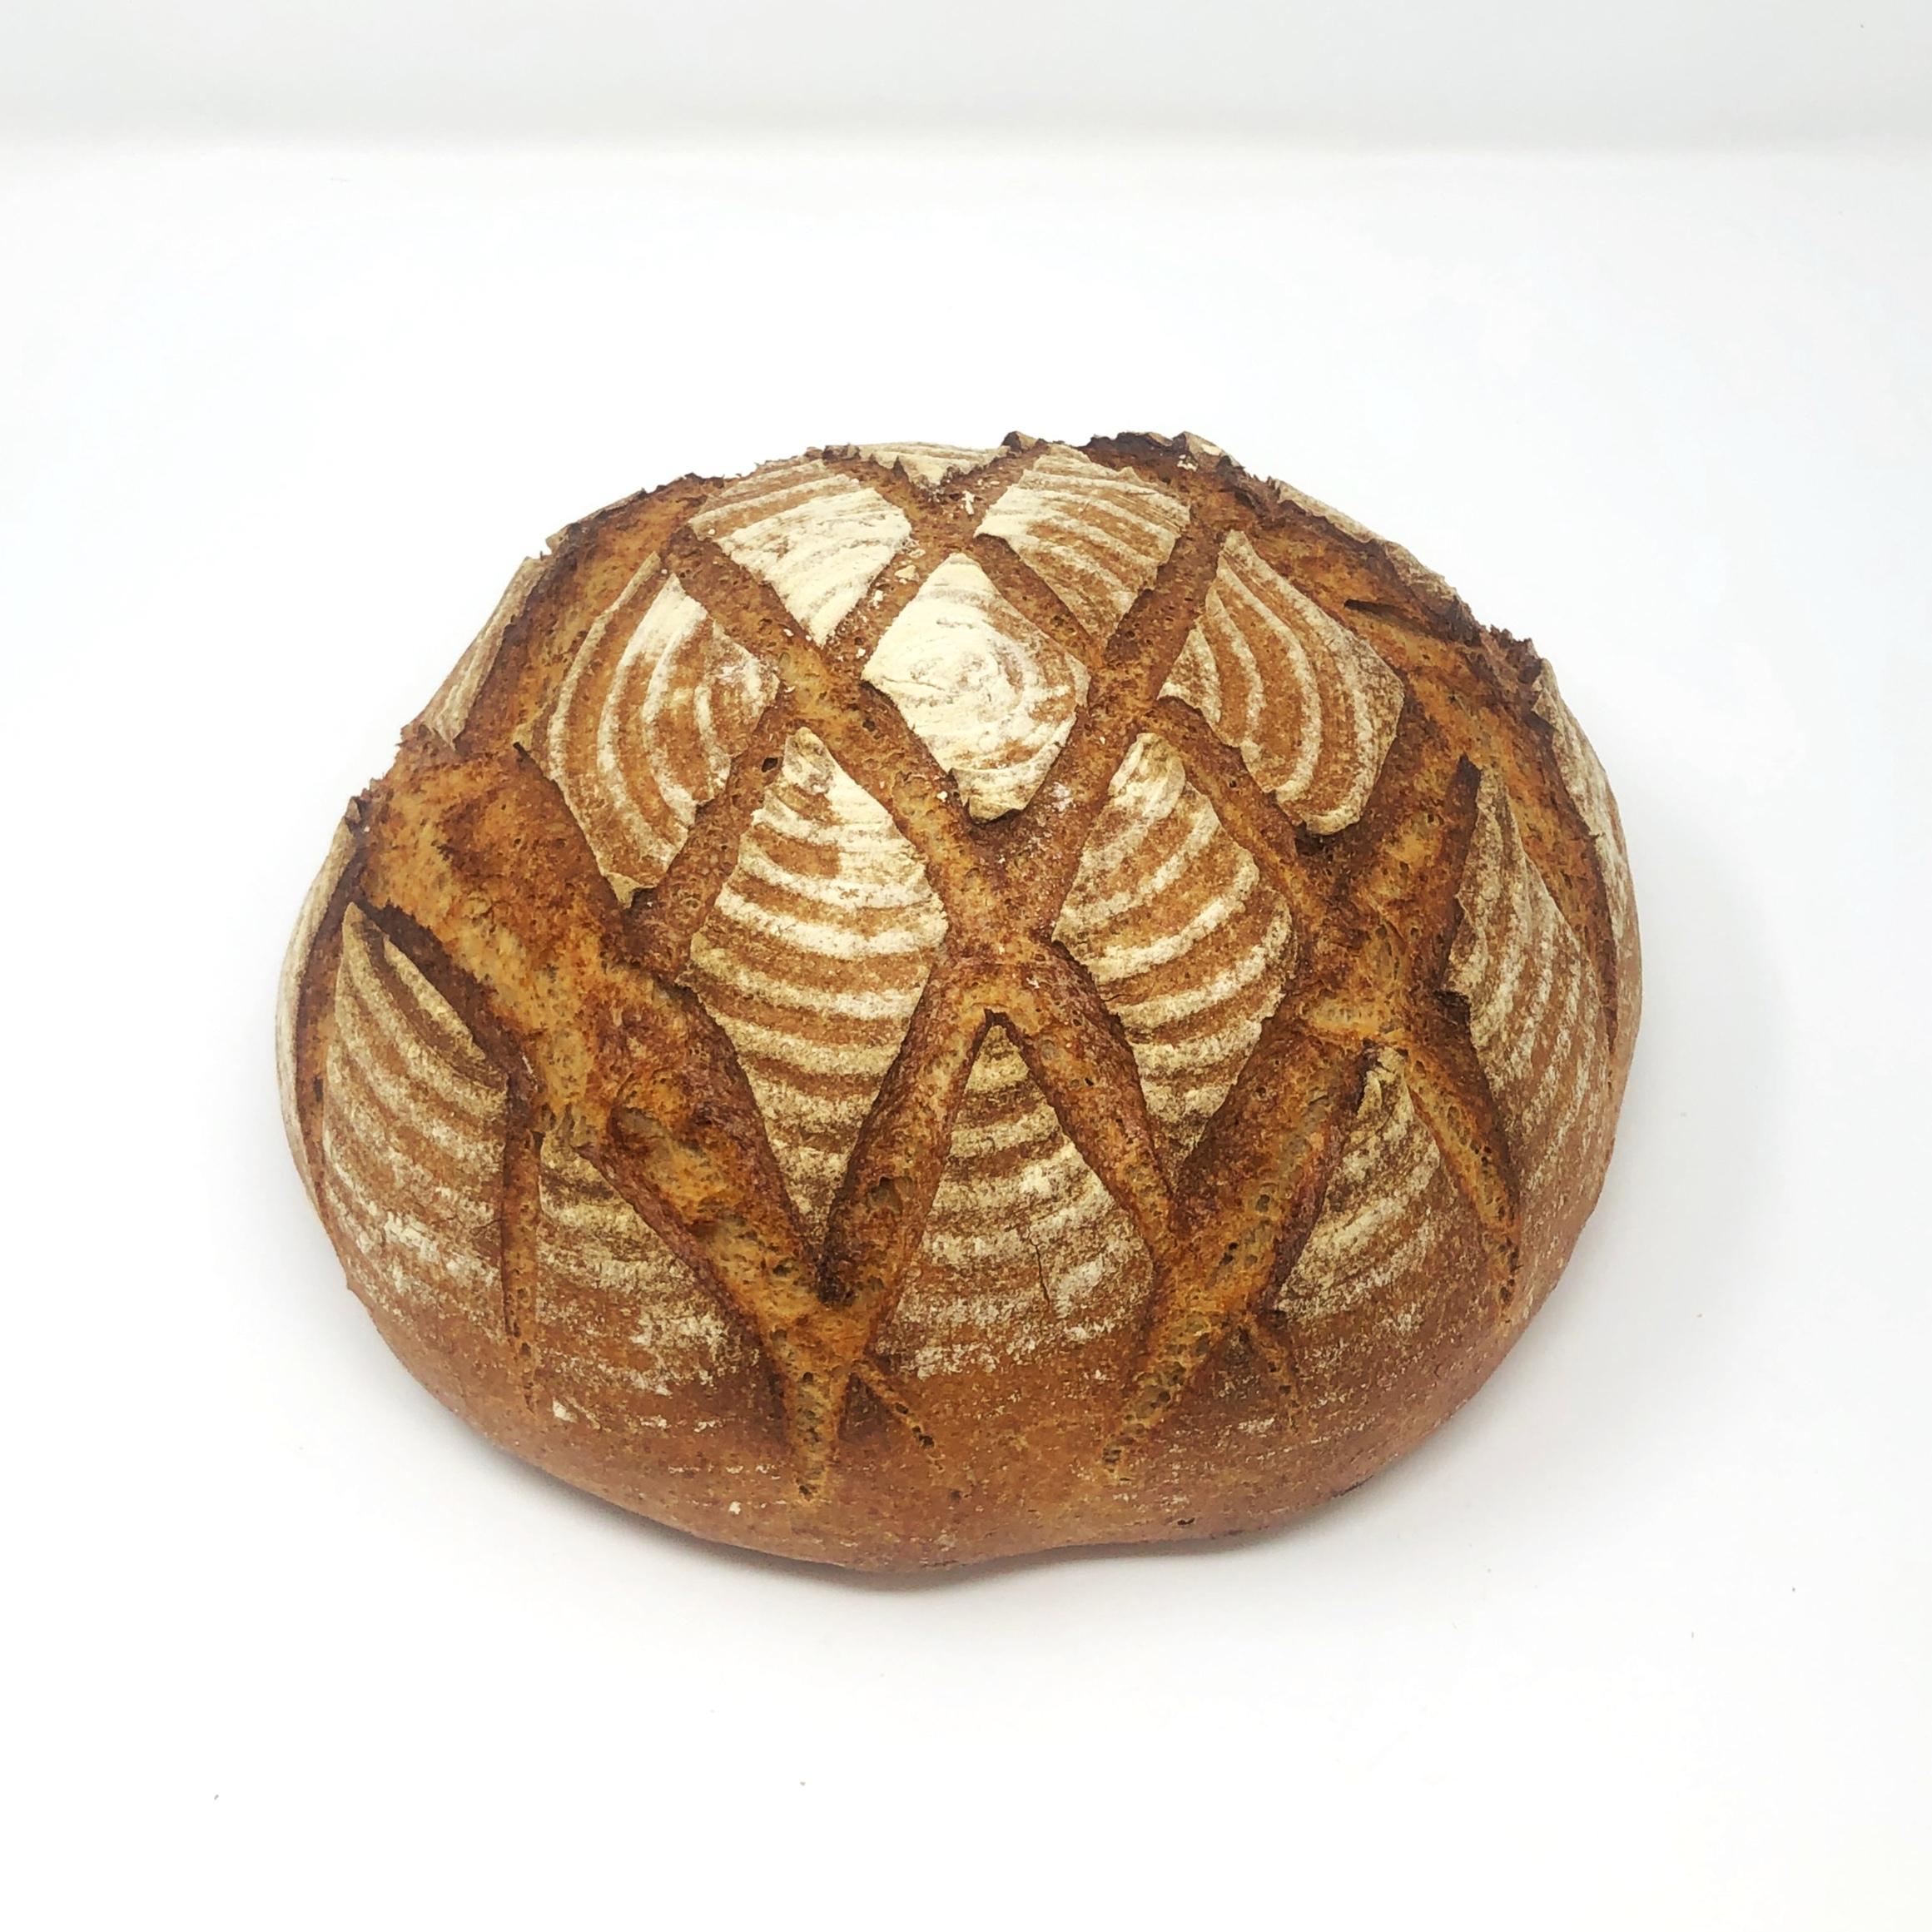 Bauernbrot [Farmer's Rye] - $ 4.50